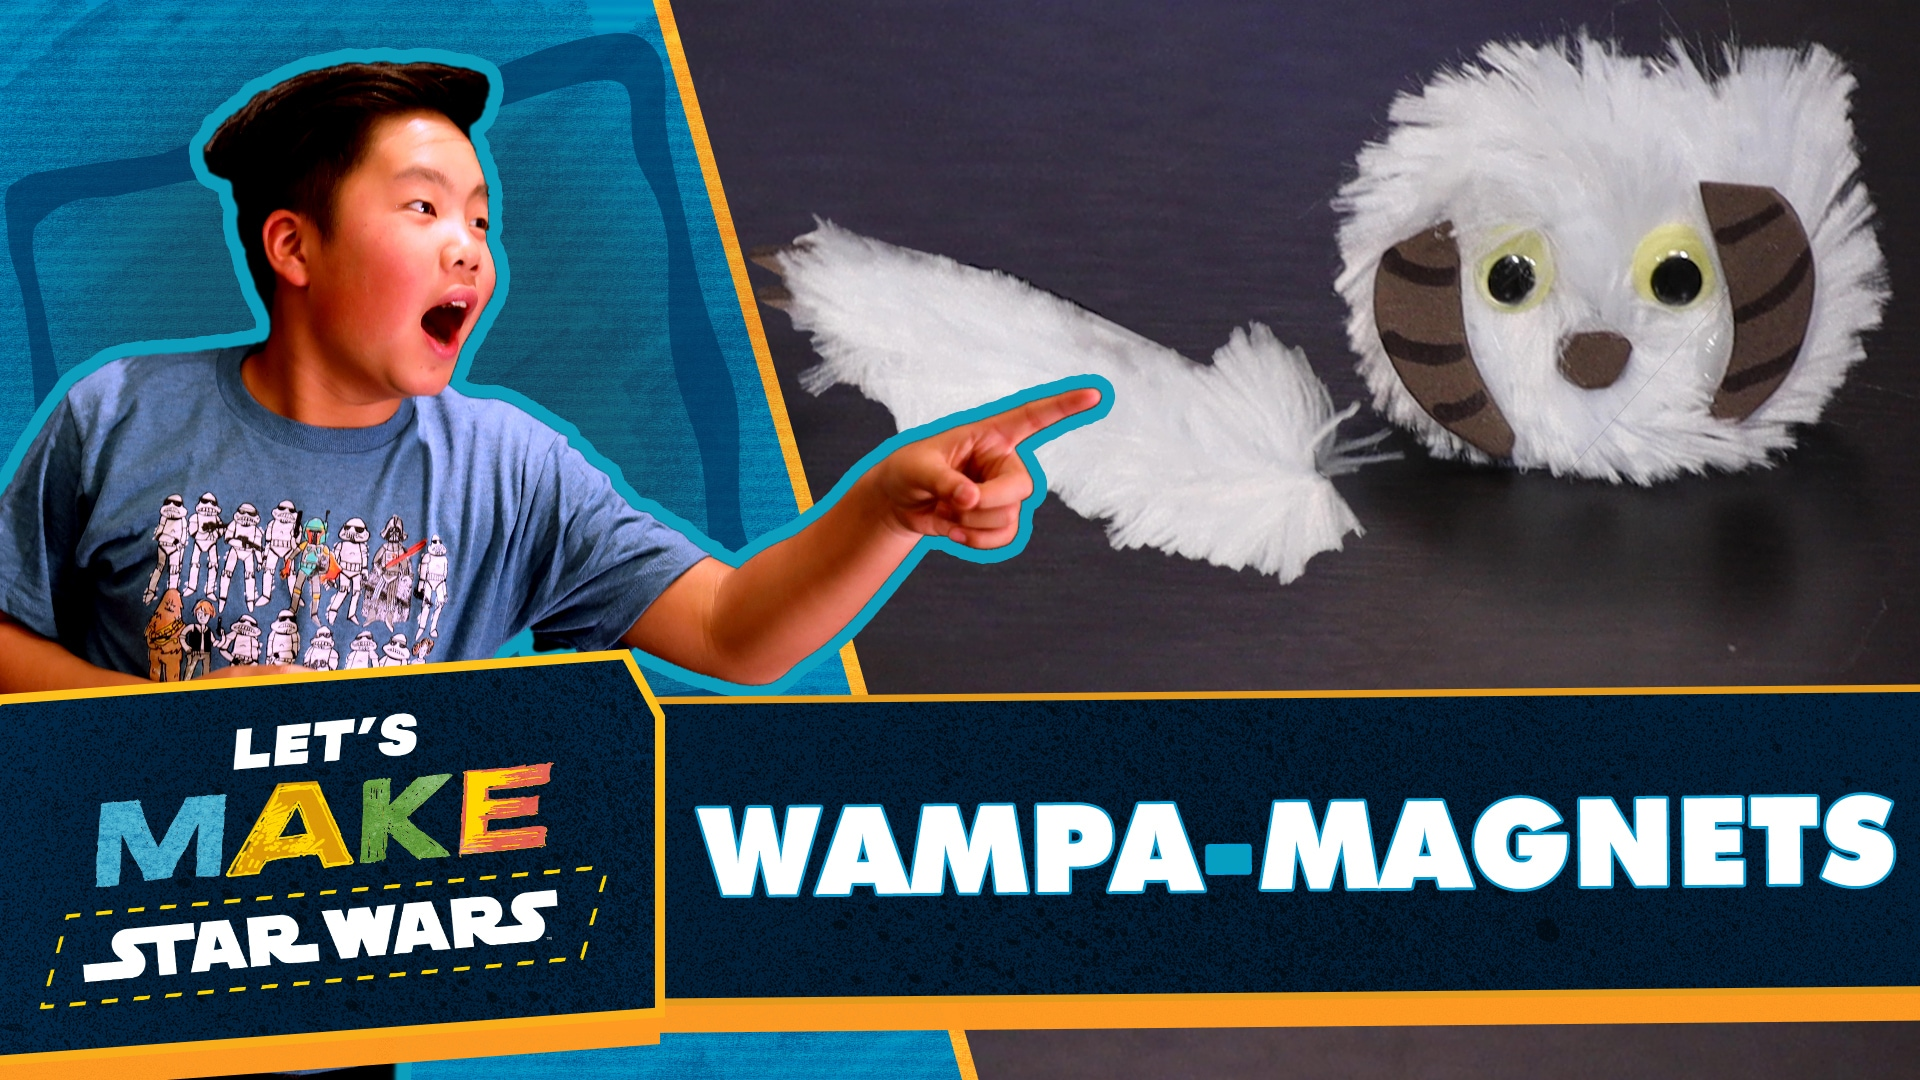 How to Make Star Wars Wampa Magnets | Let's Make Star Wars